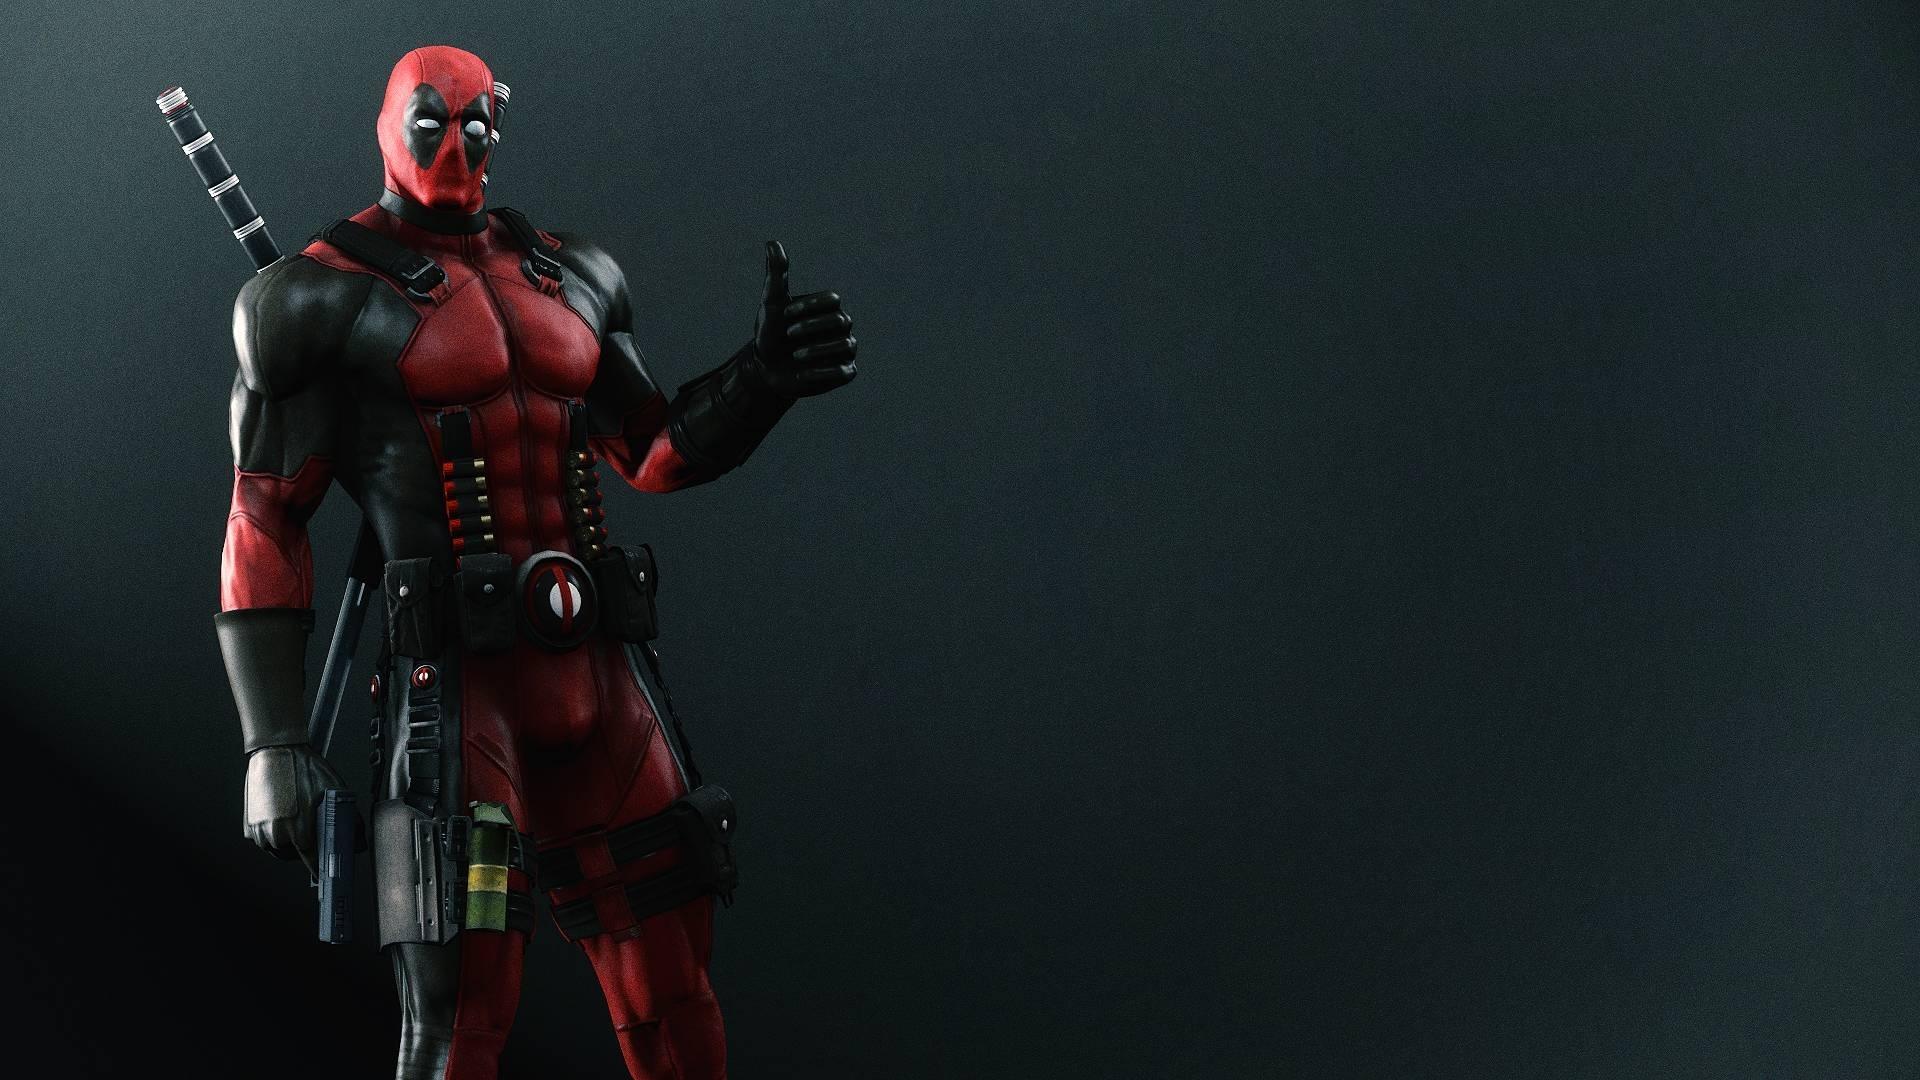 download cool superhero wallpapers simple classic red motive dark